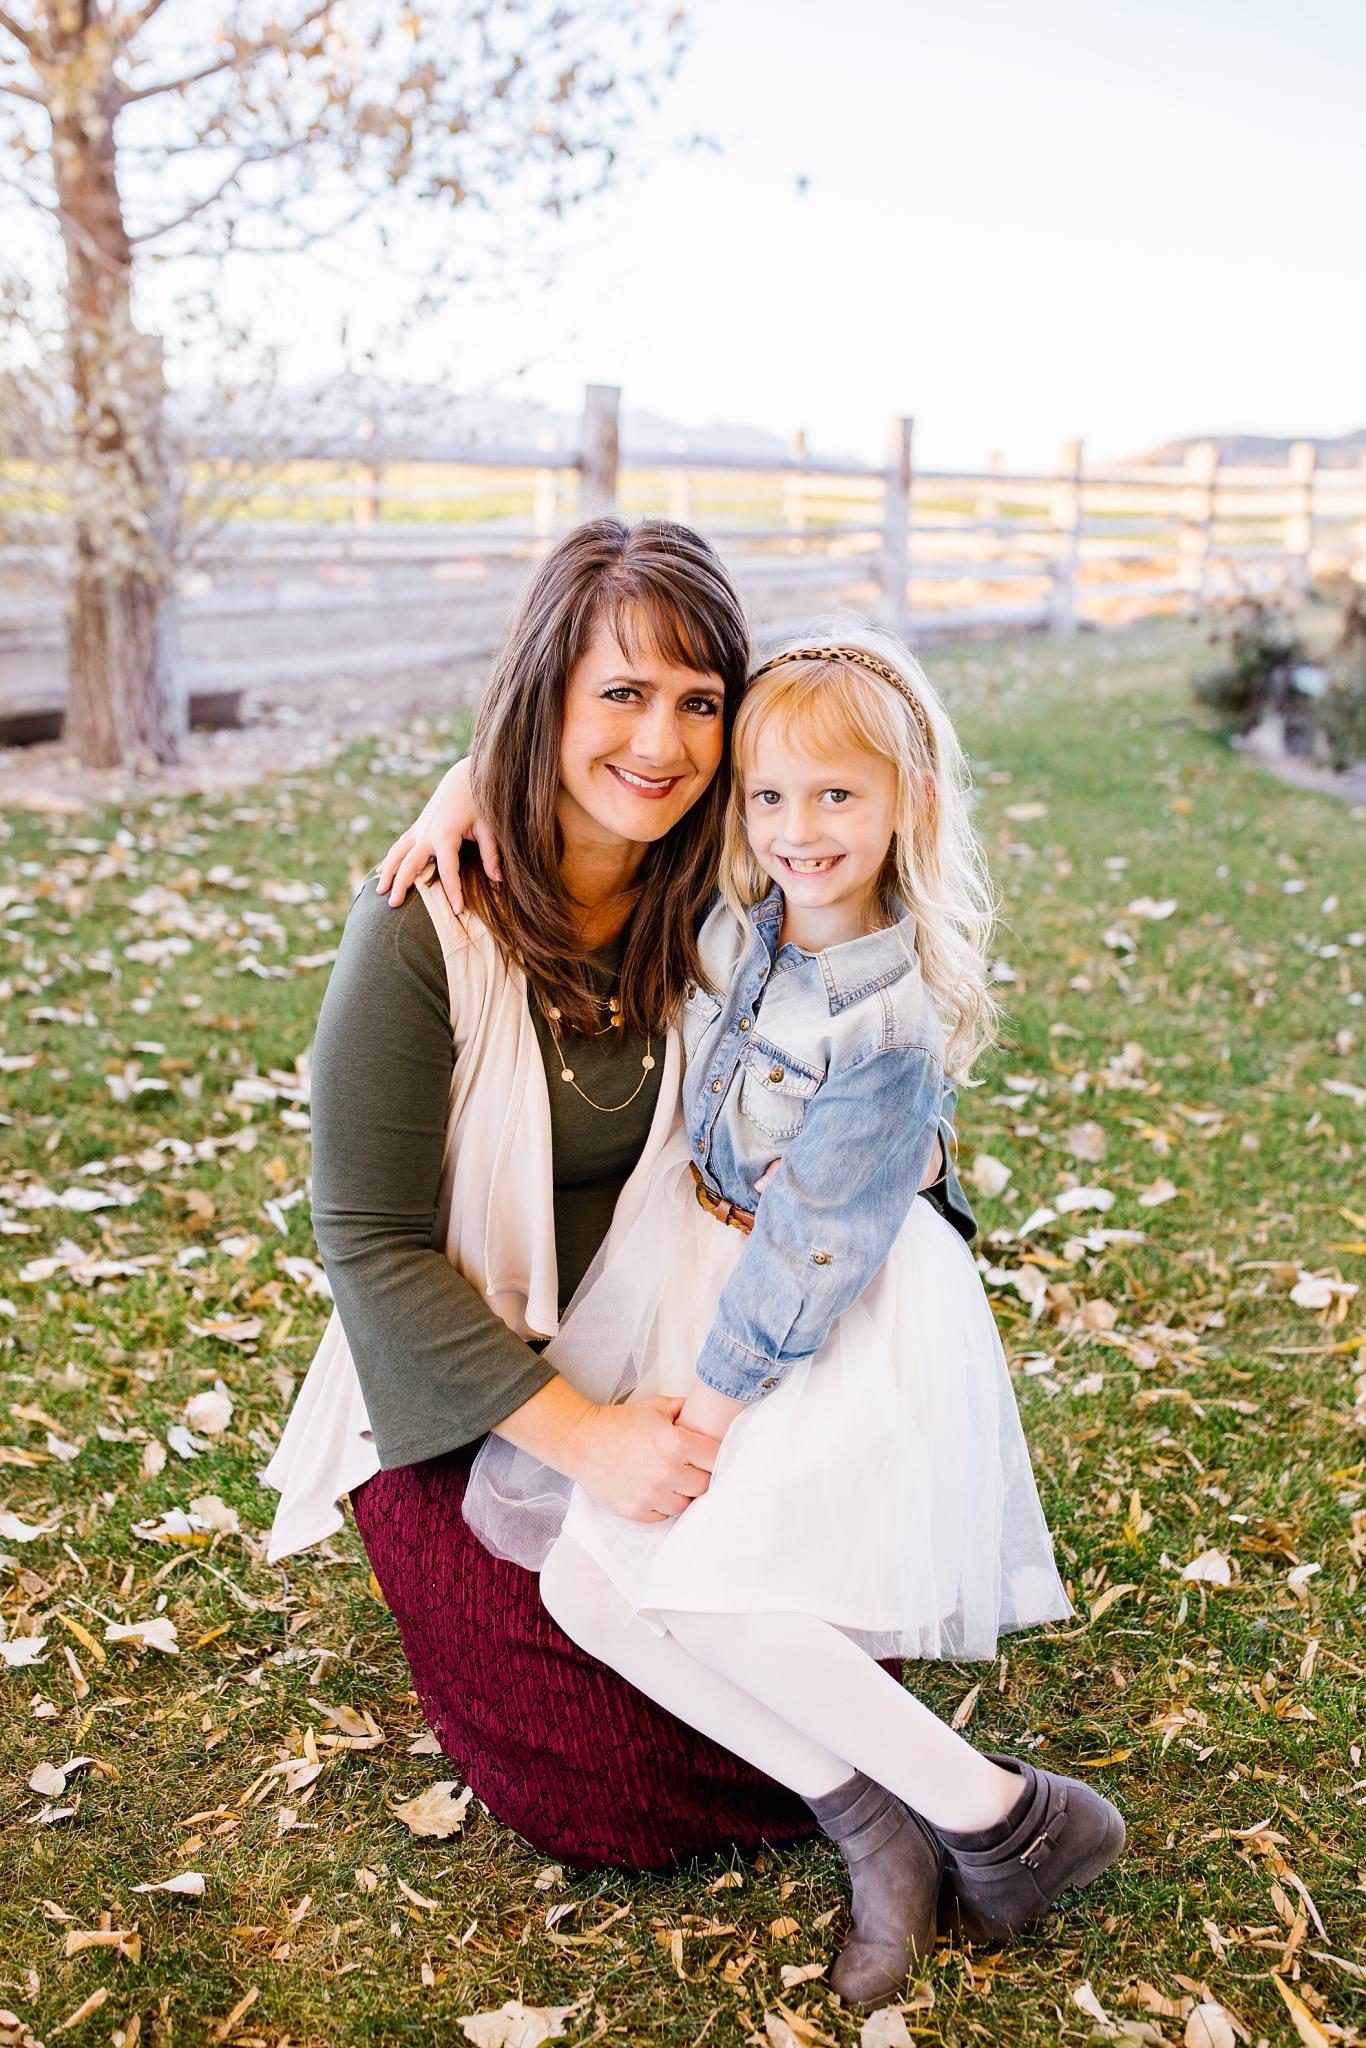 Mickelsen-39_Lizzie-B-Imagery-Utah-Family-Photographer-Lifestyle-Photography-Salt-Lake-City-Park-City-Utah-County.jpg